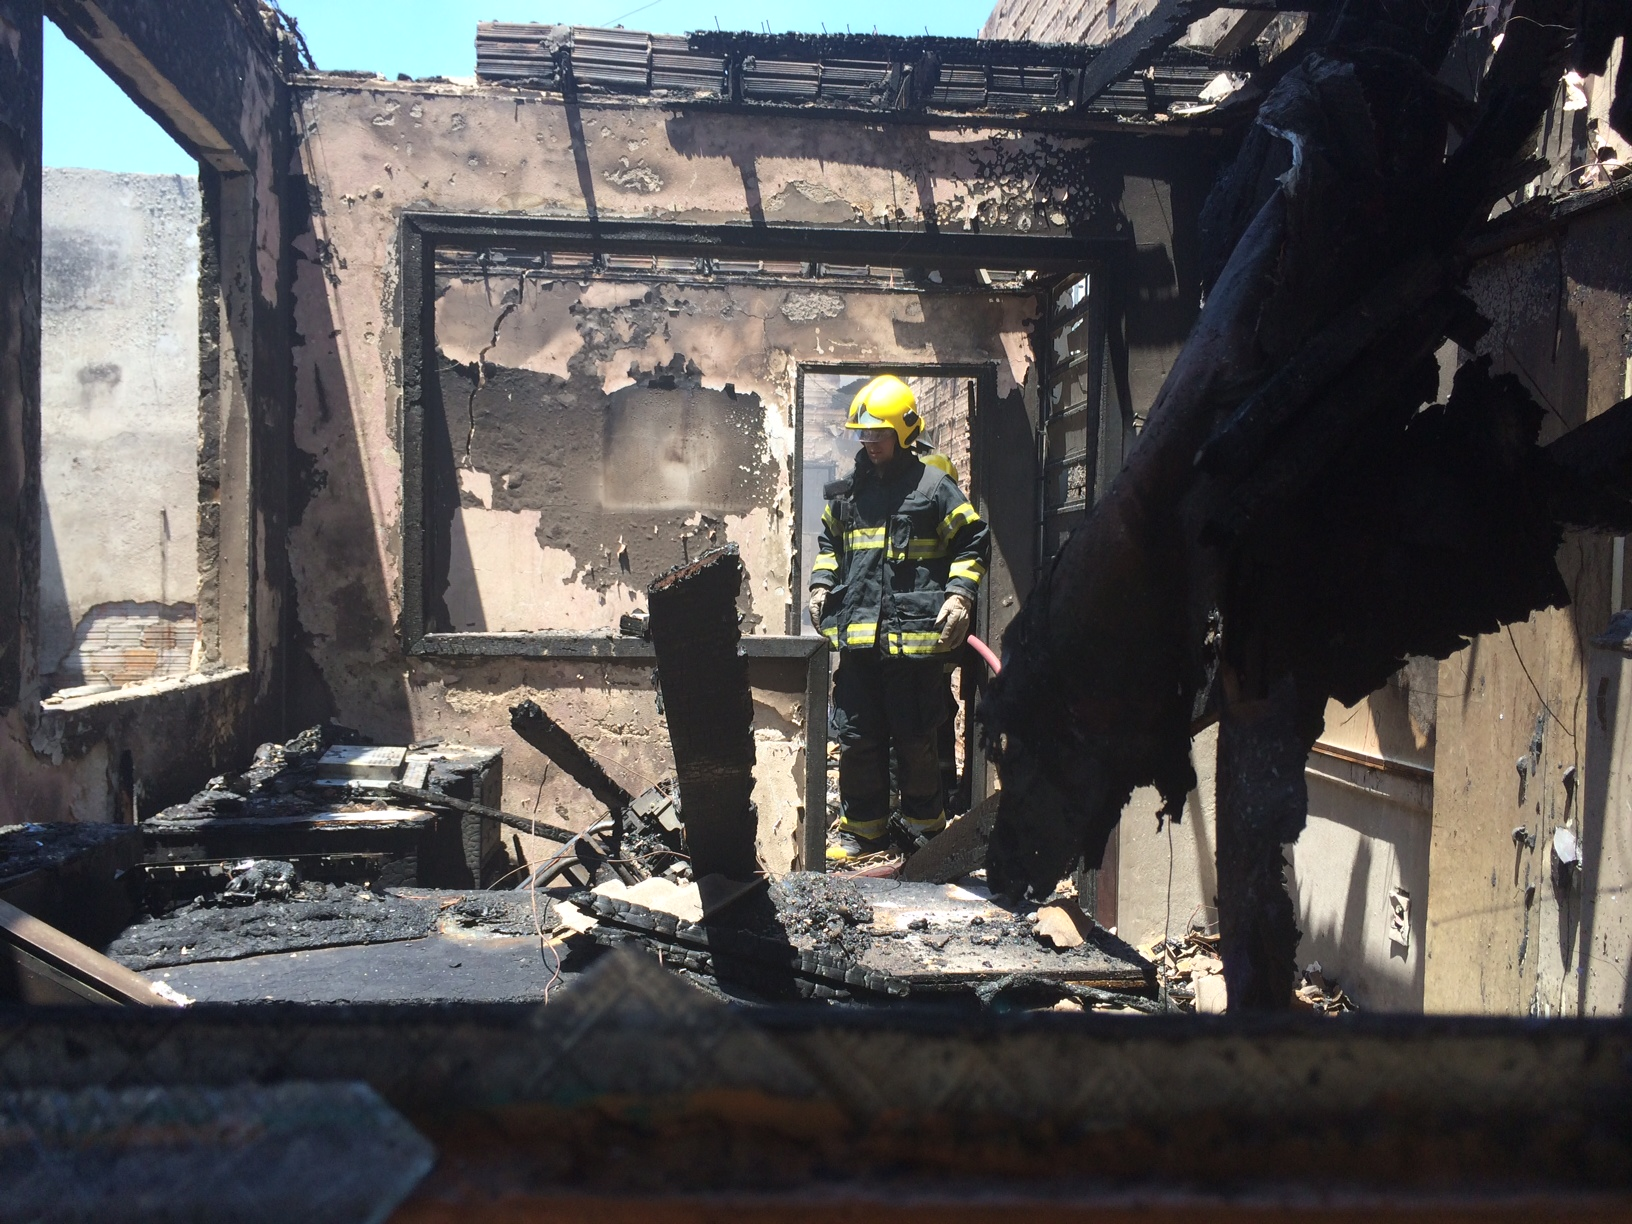 Aparador Blanco Barato ~ Fogo destrói loja de radiadores na zona norte de Porto Alegre Gaúcha